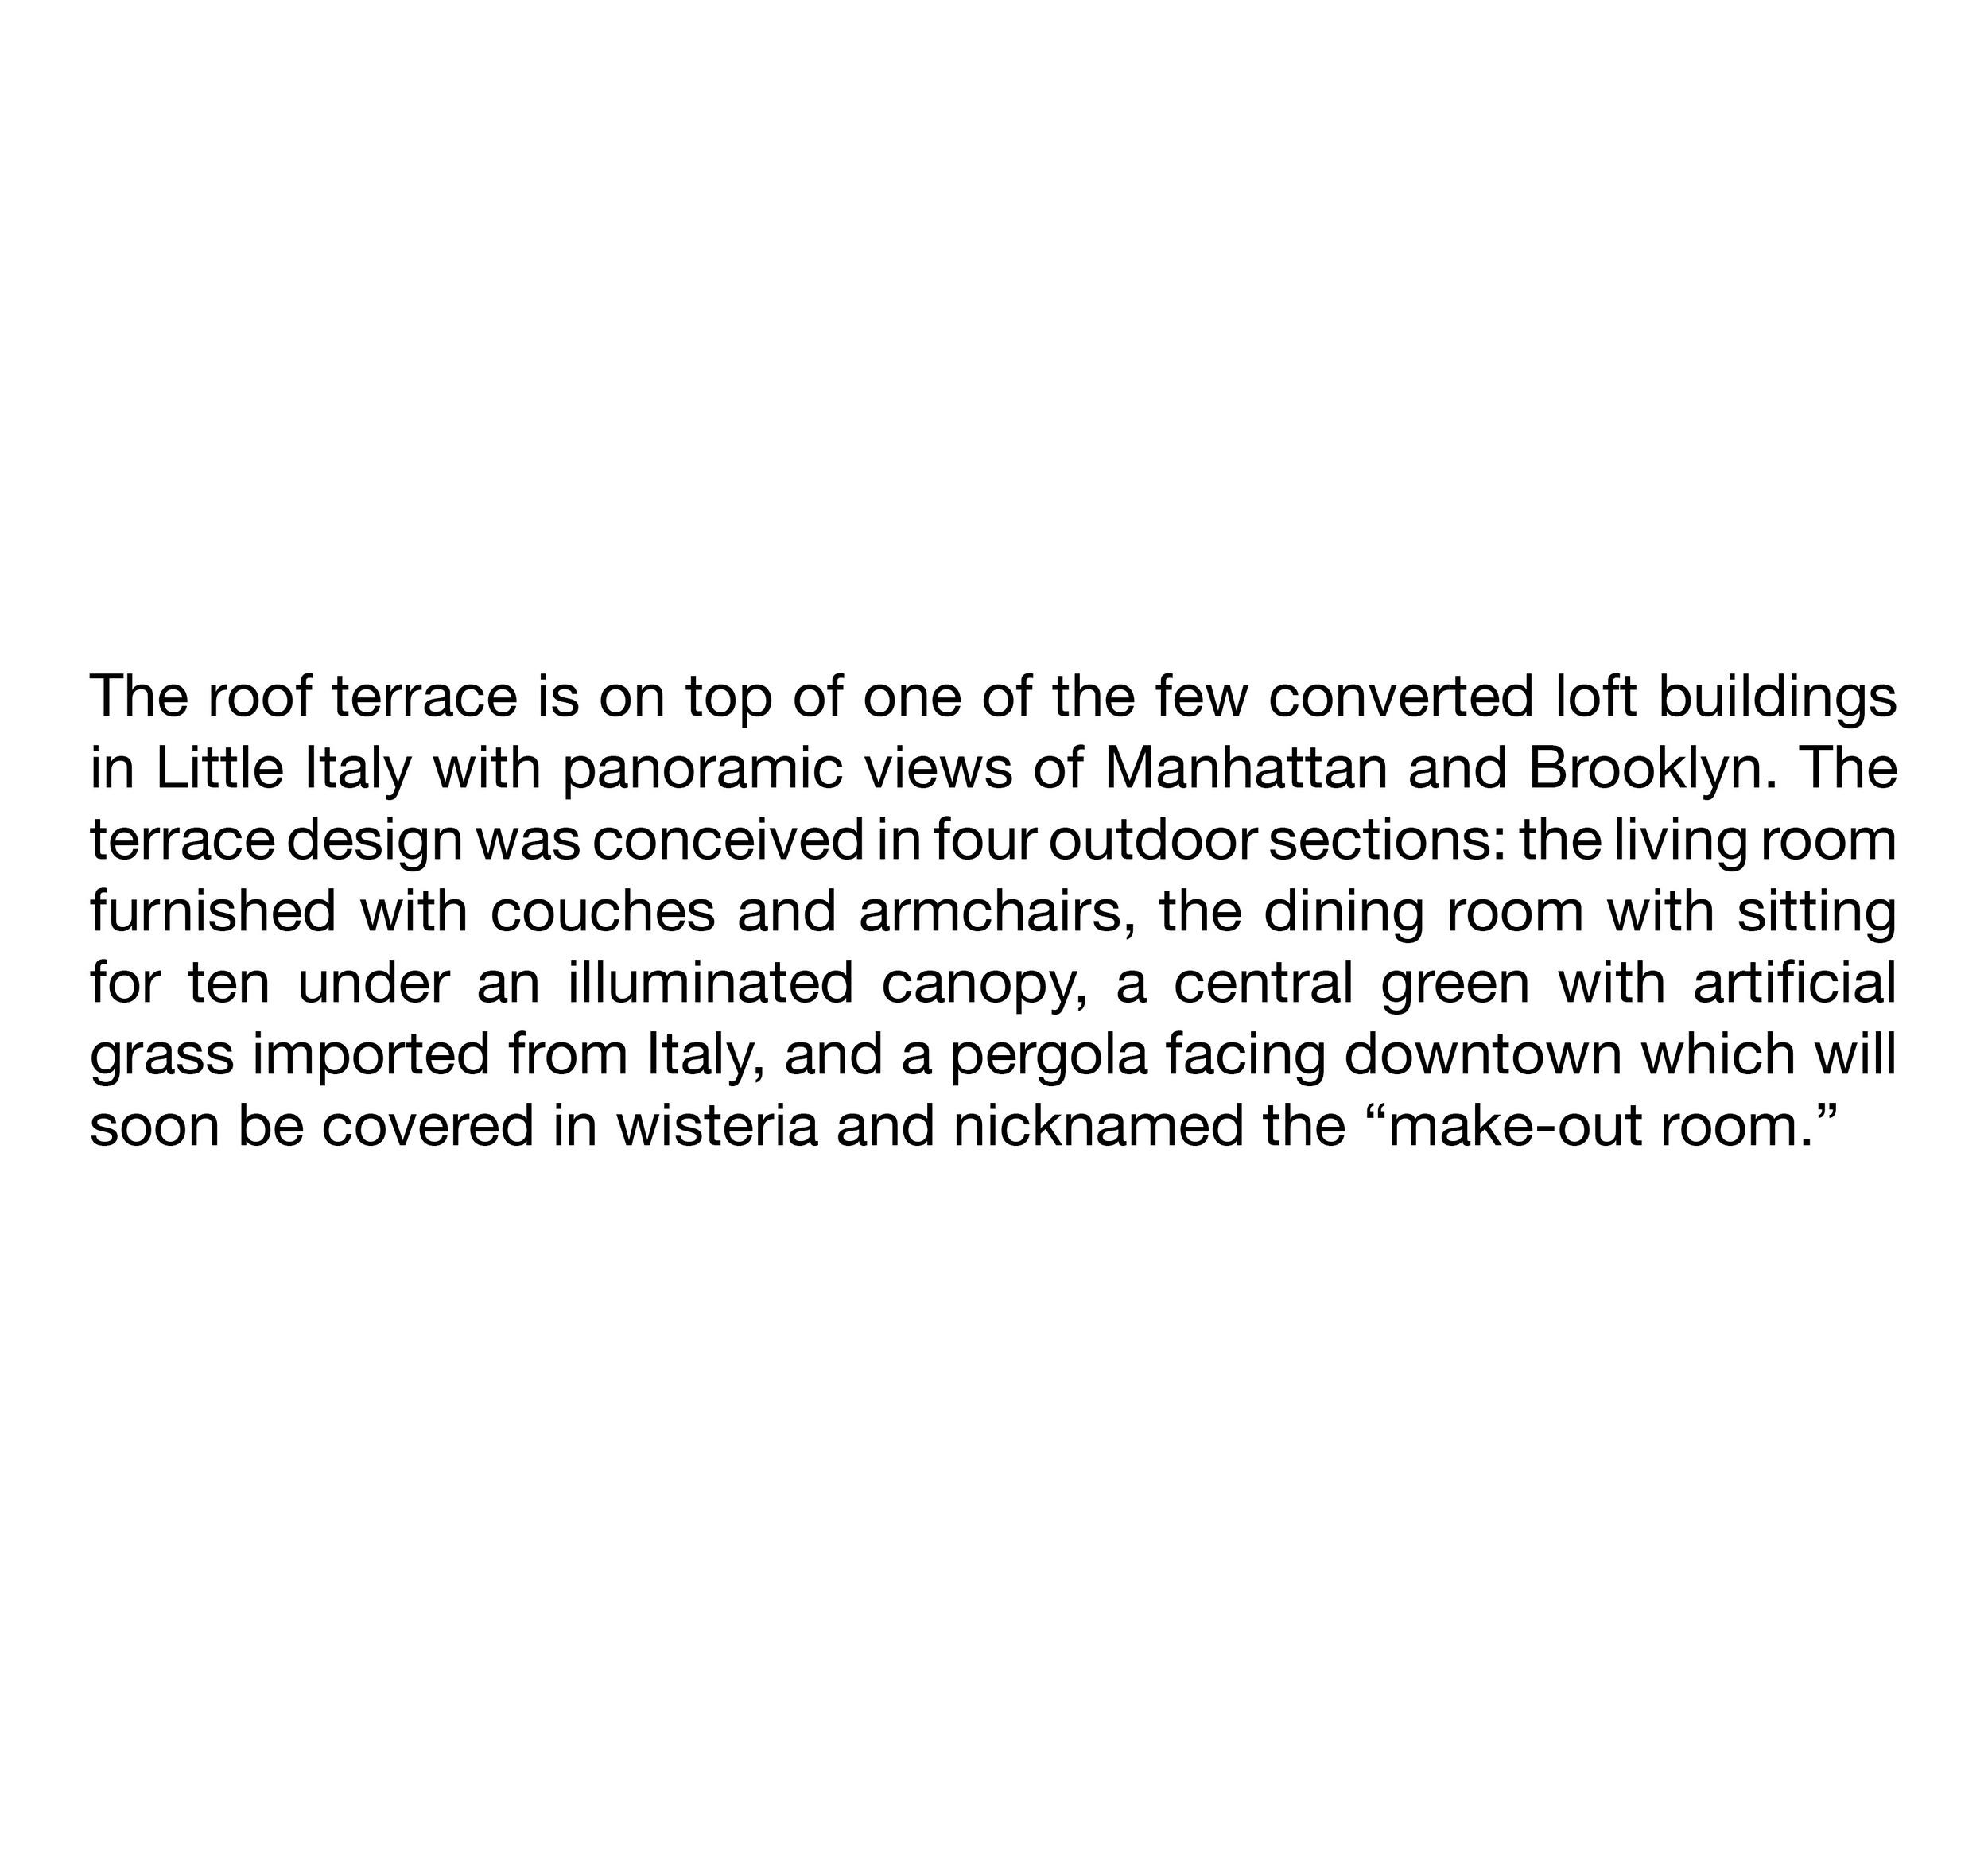 ACHA, Roof Terrace, Pergola, Canopy, 285 Lafayette Street,Little Italy, Manhattan, NYC